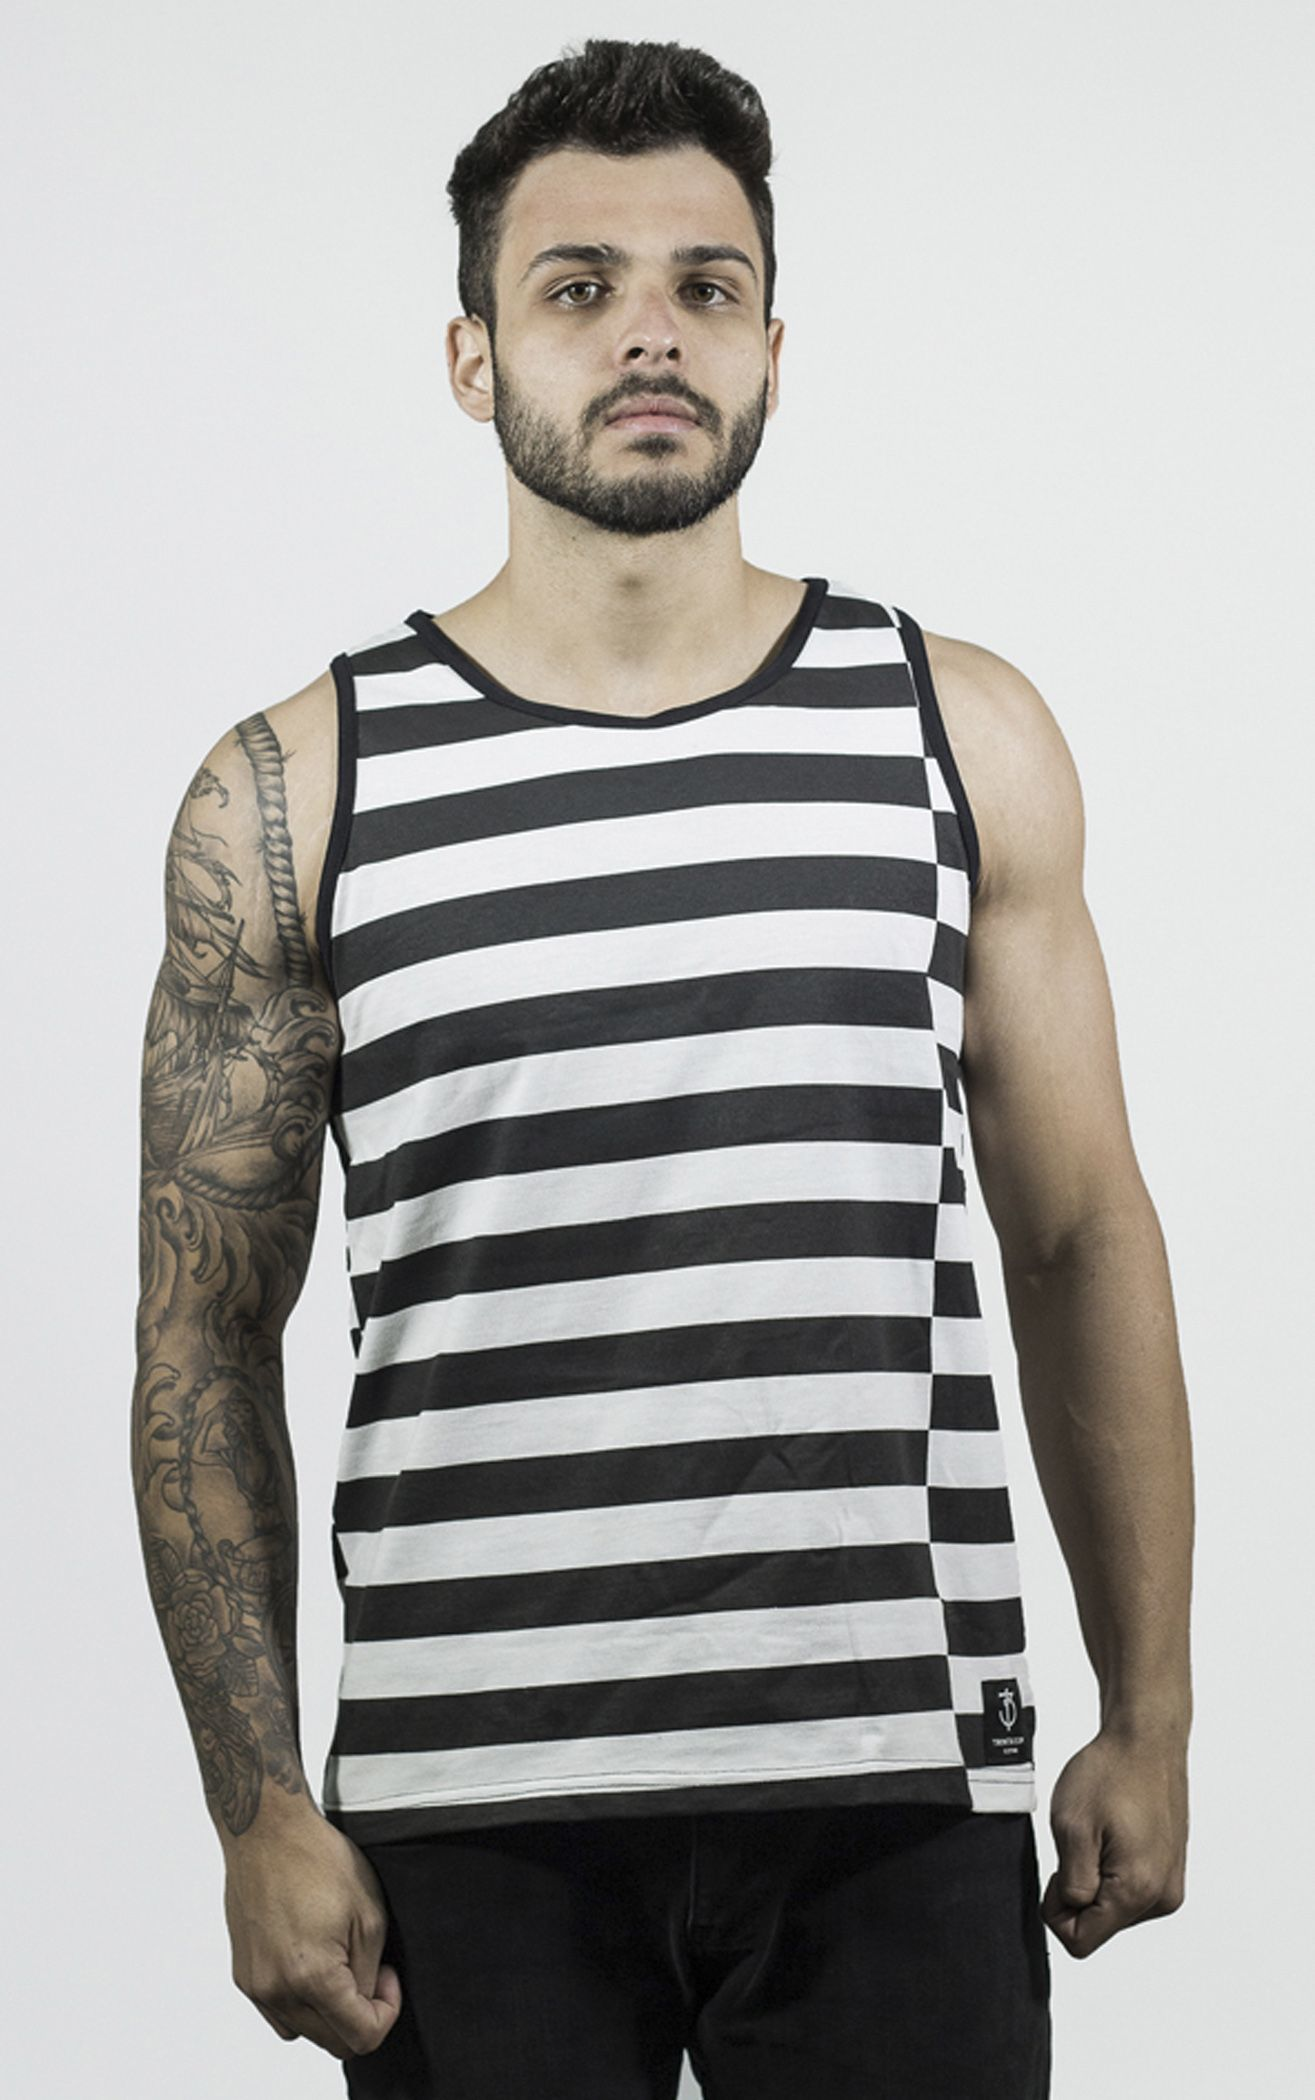 Regata estampada LISTRAS - 31 CLOTHING